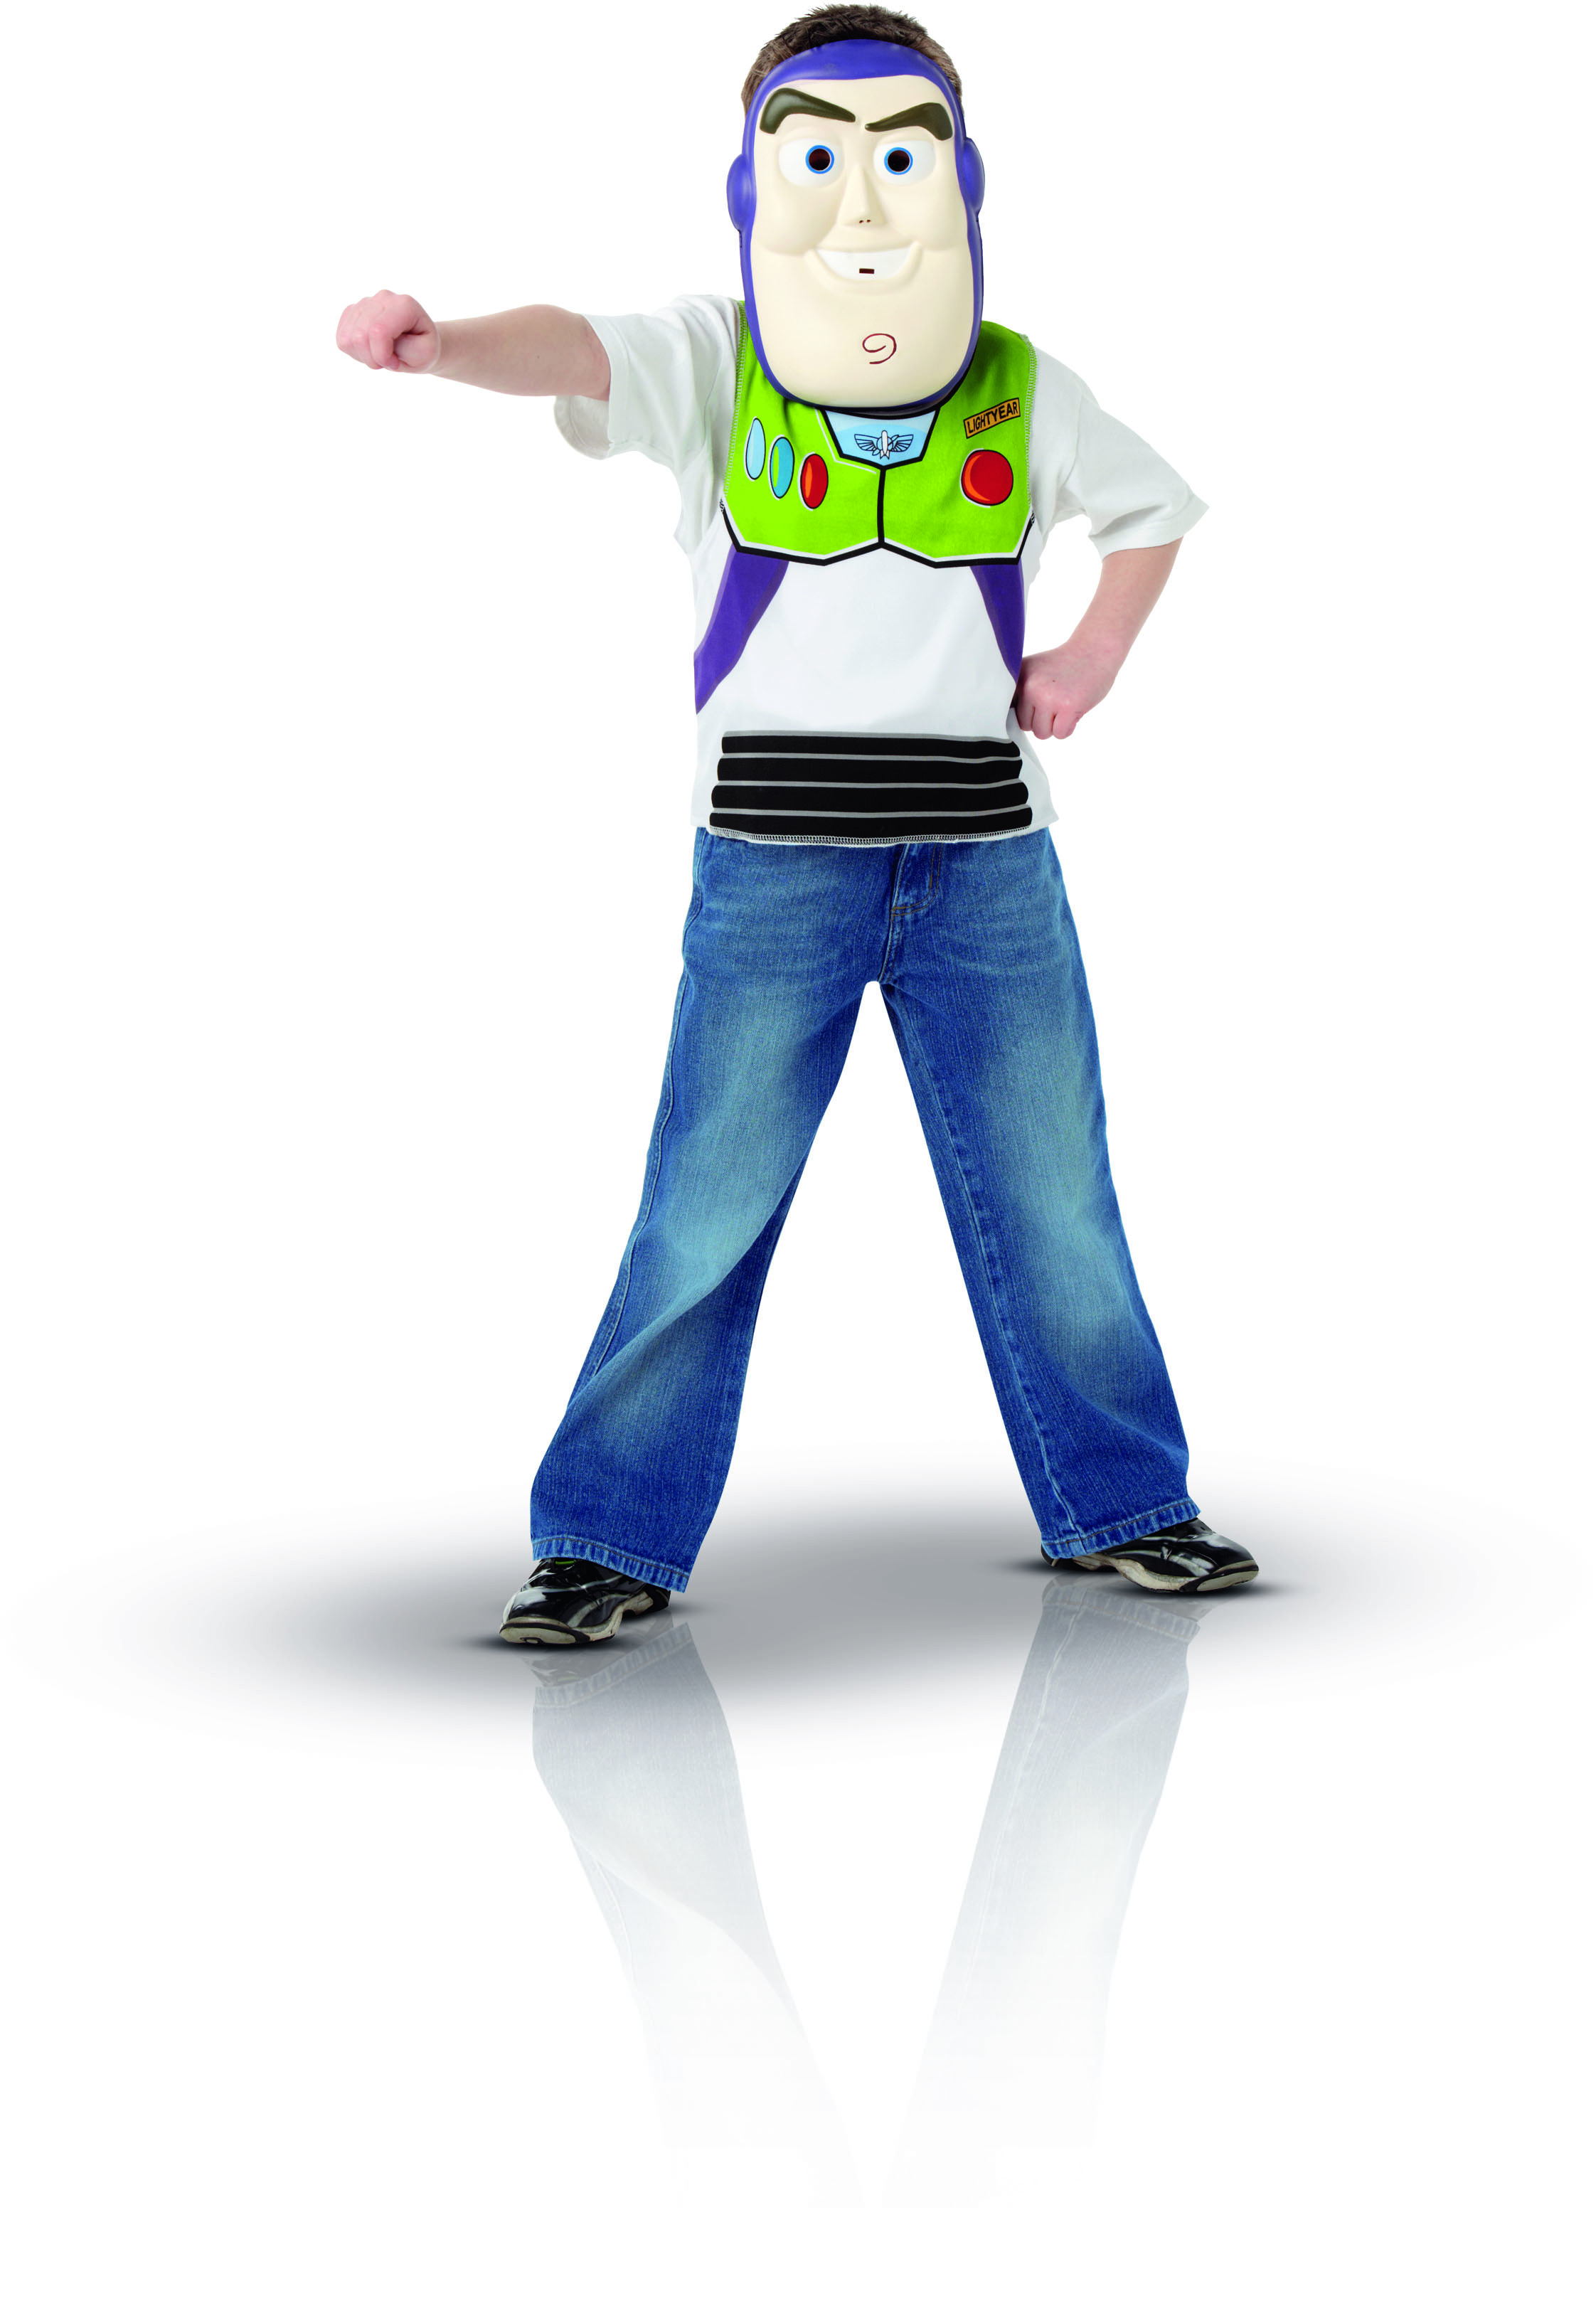 Kit Buzz l'Eclair?- (Toy Story?- Disney/Pixar©)